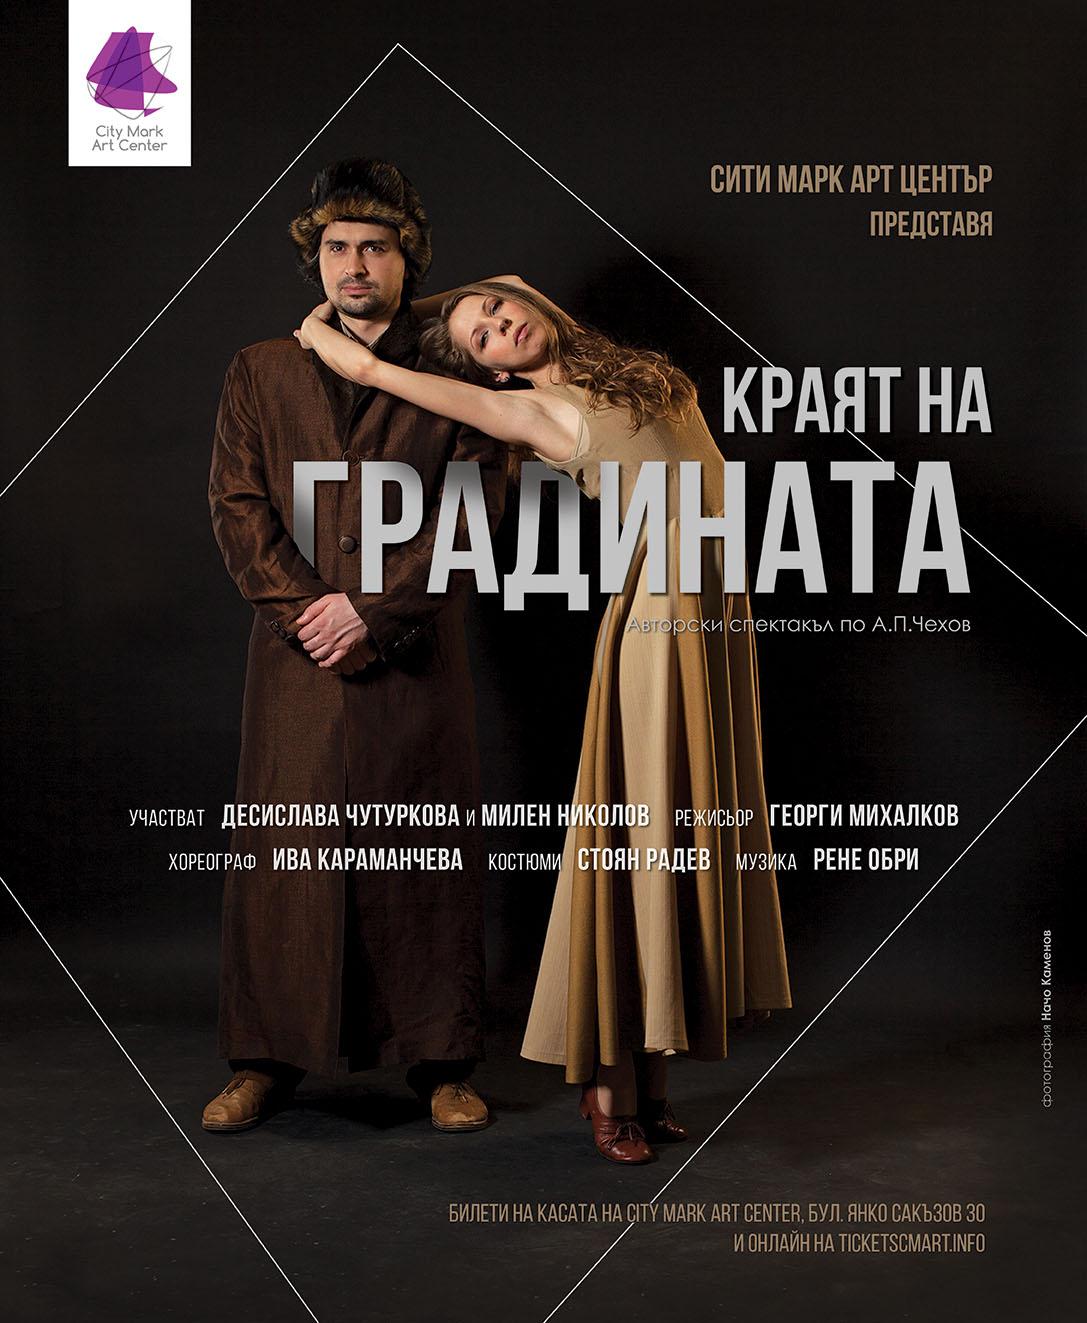 CMAC_Gradinata_Poster_92x112cm_1